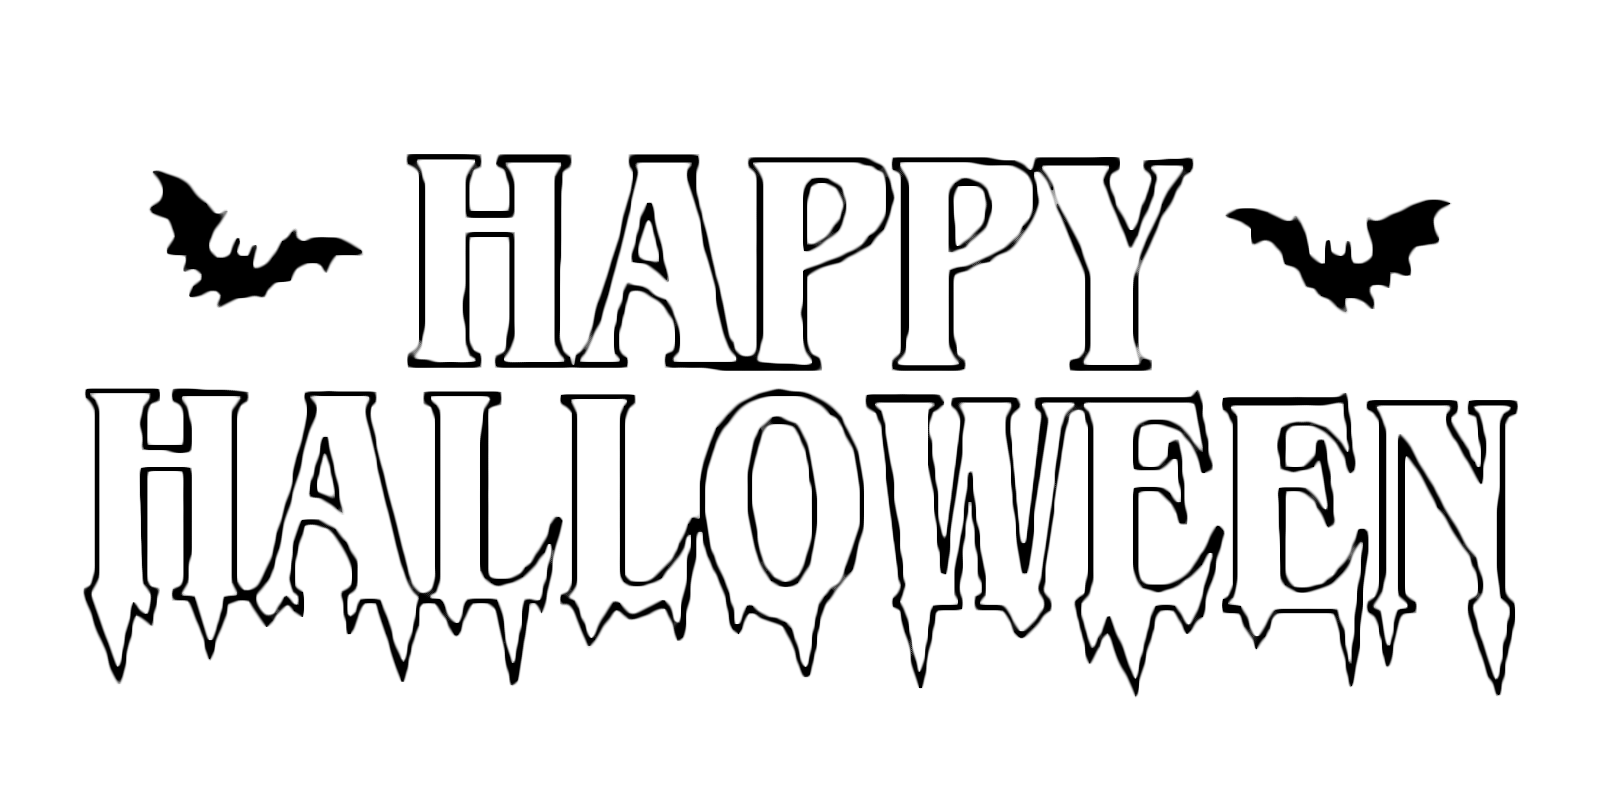 31 Days To Scare Halloween Treats The Mn Movie Man